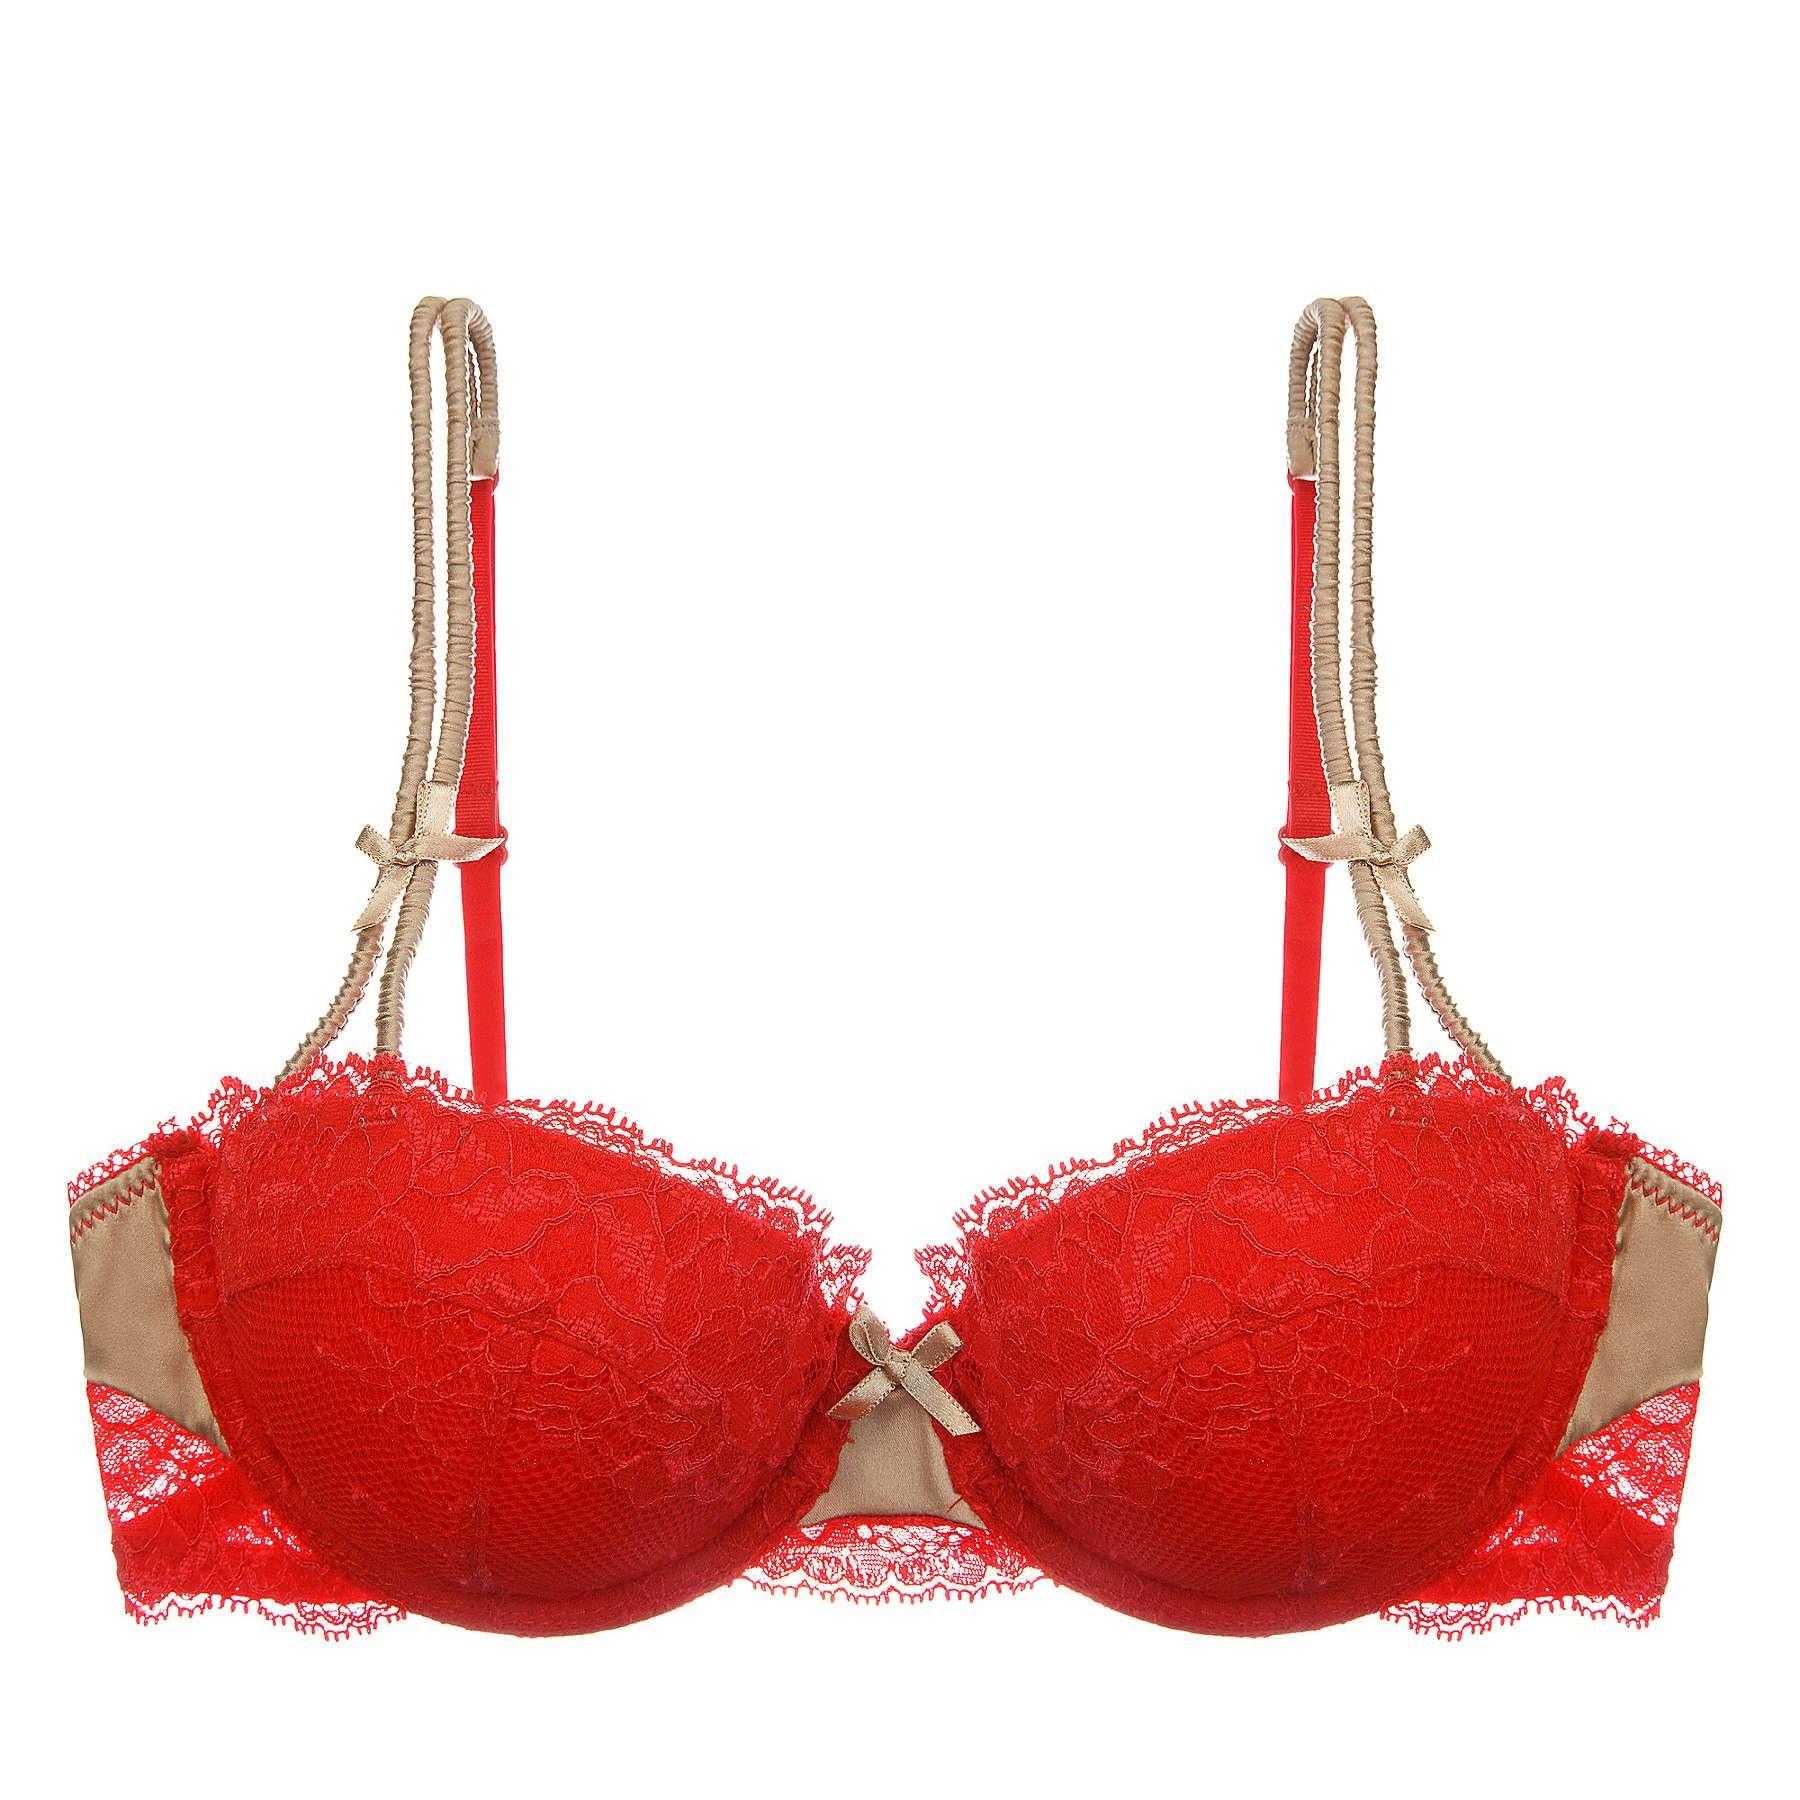 c3144b7486f18 Lyst - Heidi Klum Heat Wave Contour Balconnet Bra in Red